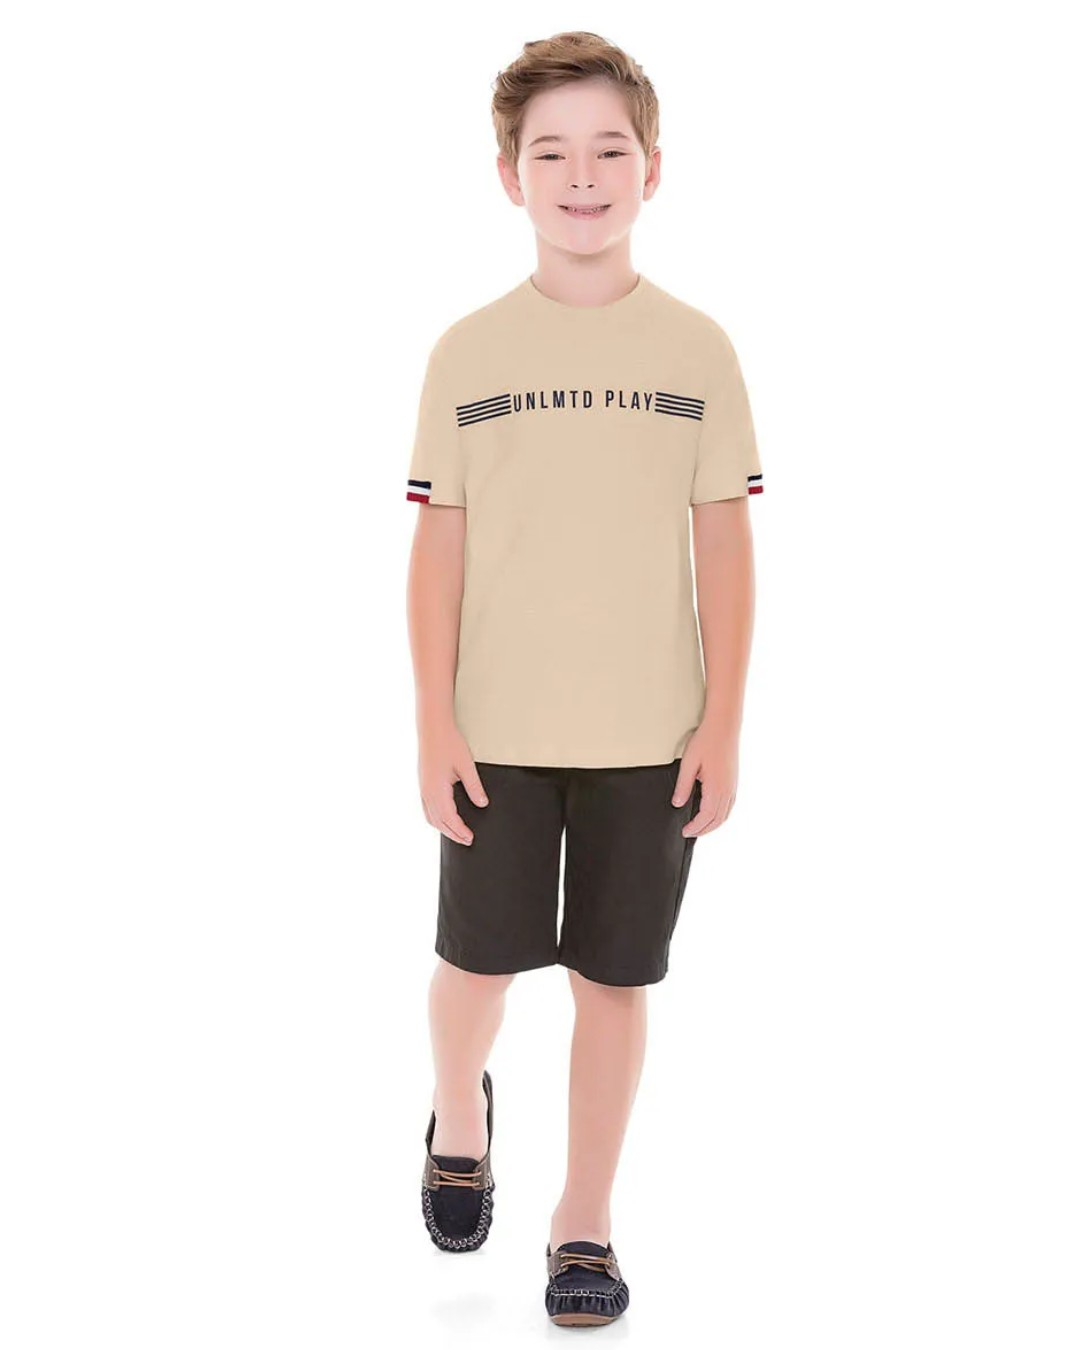 Camiseta Infantil Unlmtd Play - Playground